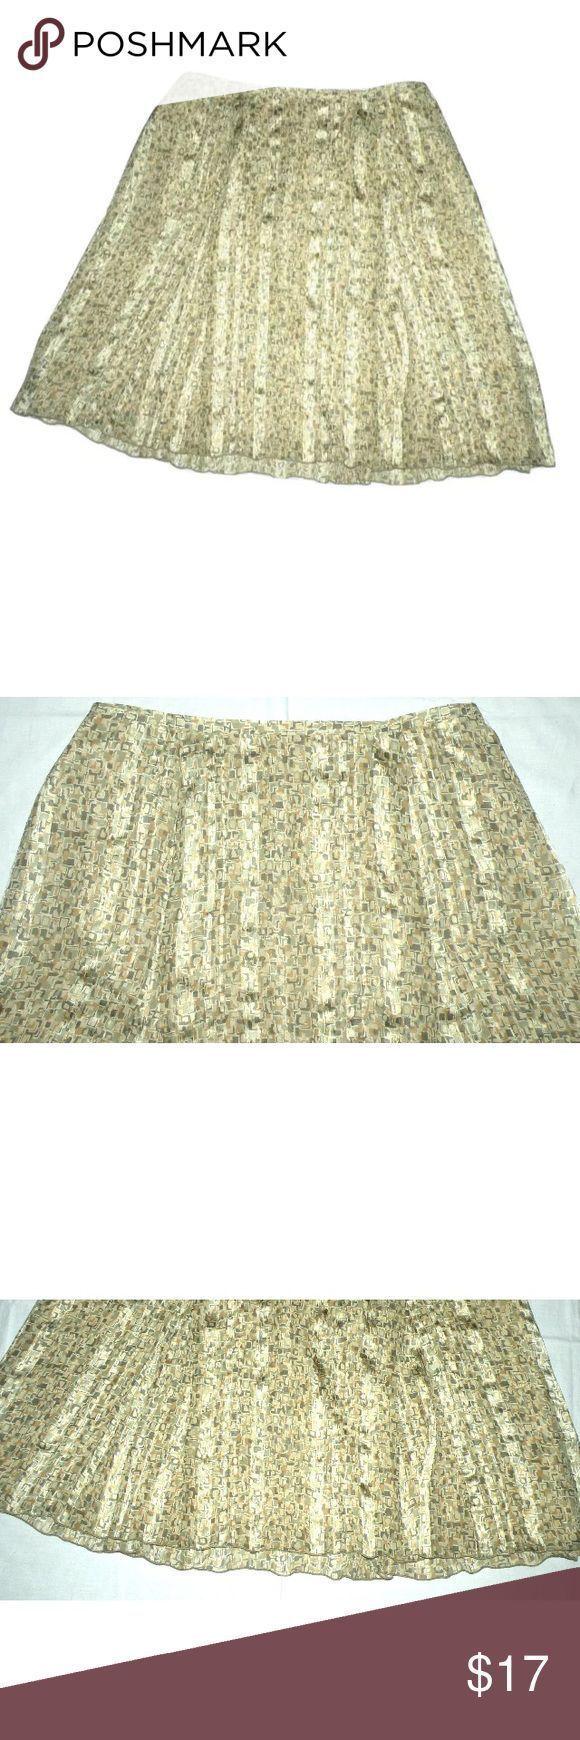 Tendance salopette 2017  awesome Tendance salopette 2017  Plus Size Talbots Pure Silk Skirt